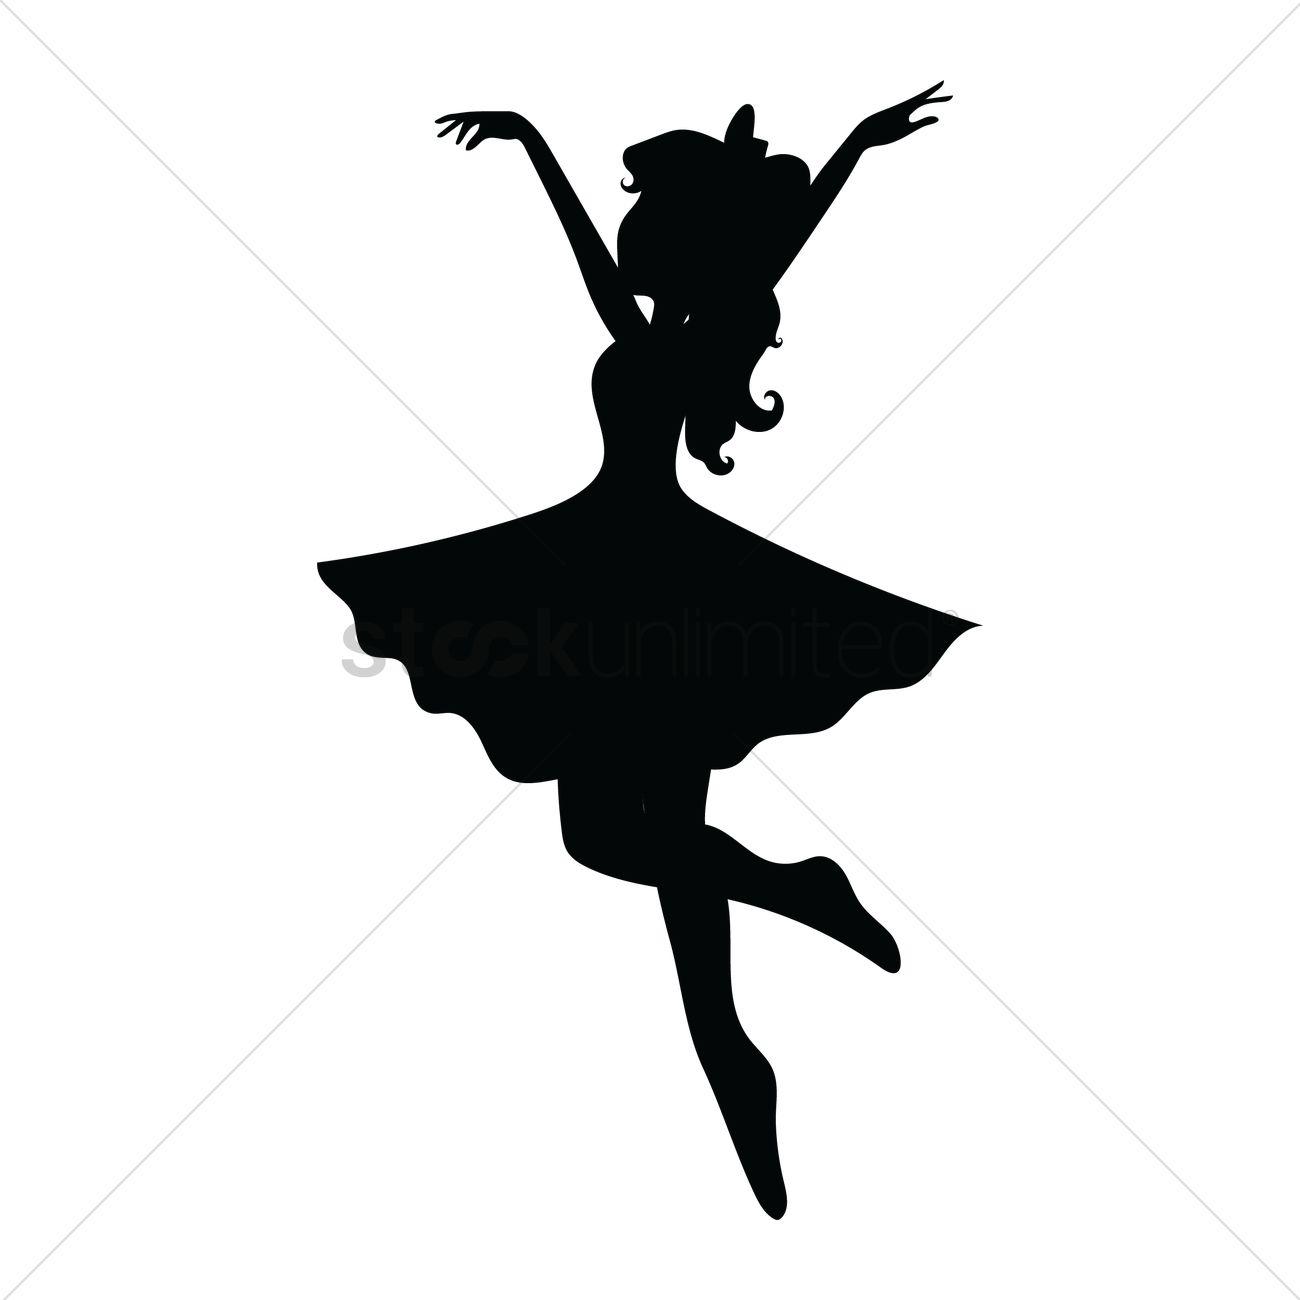 girl dancing vector image - 1414151 | stockunlimited